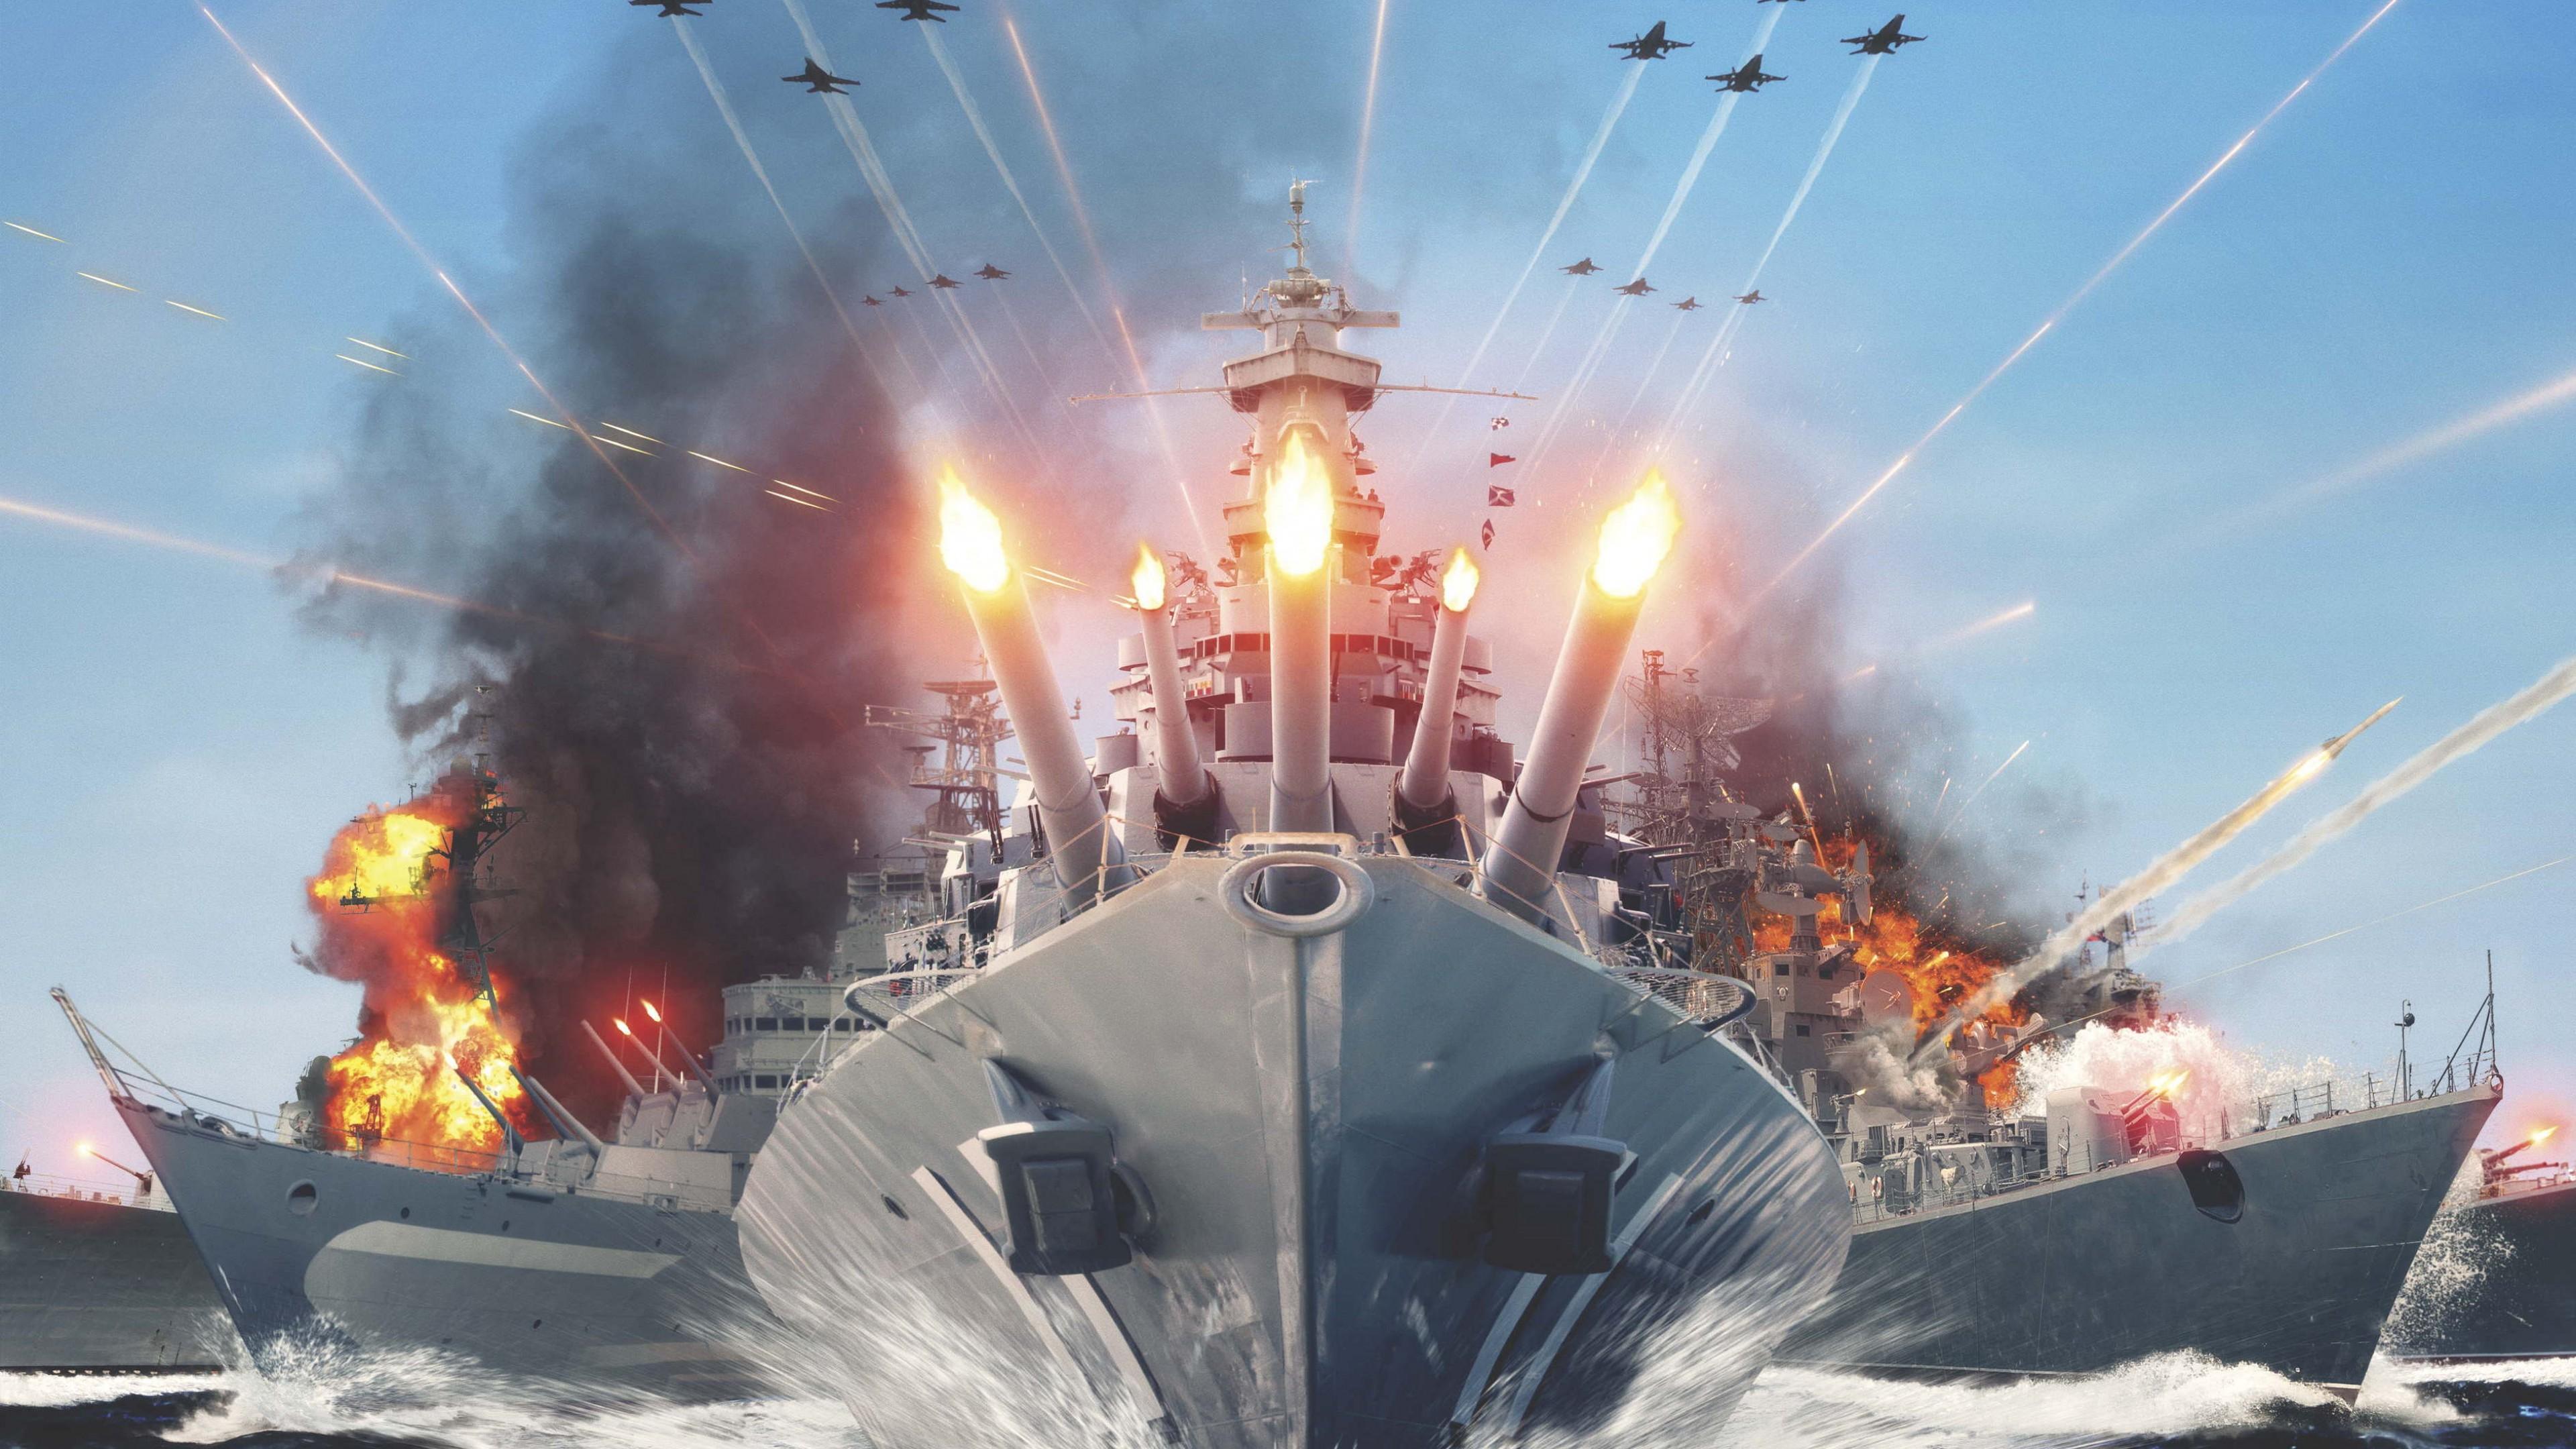 Wallpaper World Of Warships Game Mmorpg Simulator Sea Water